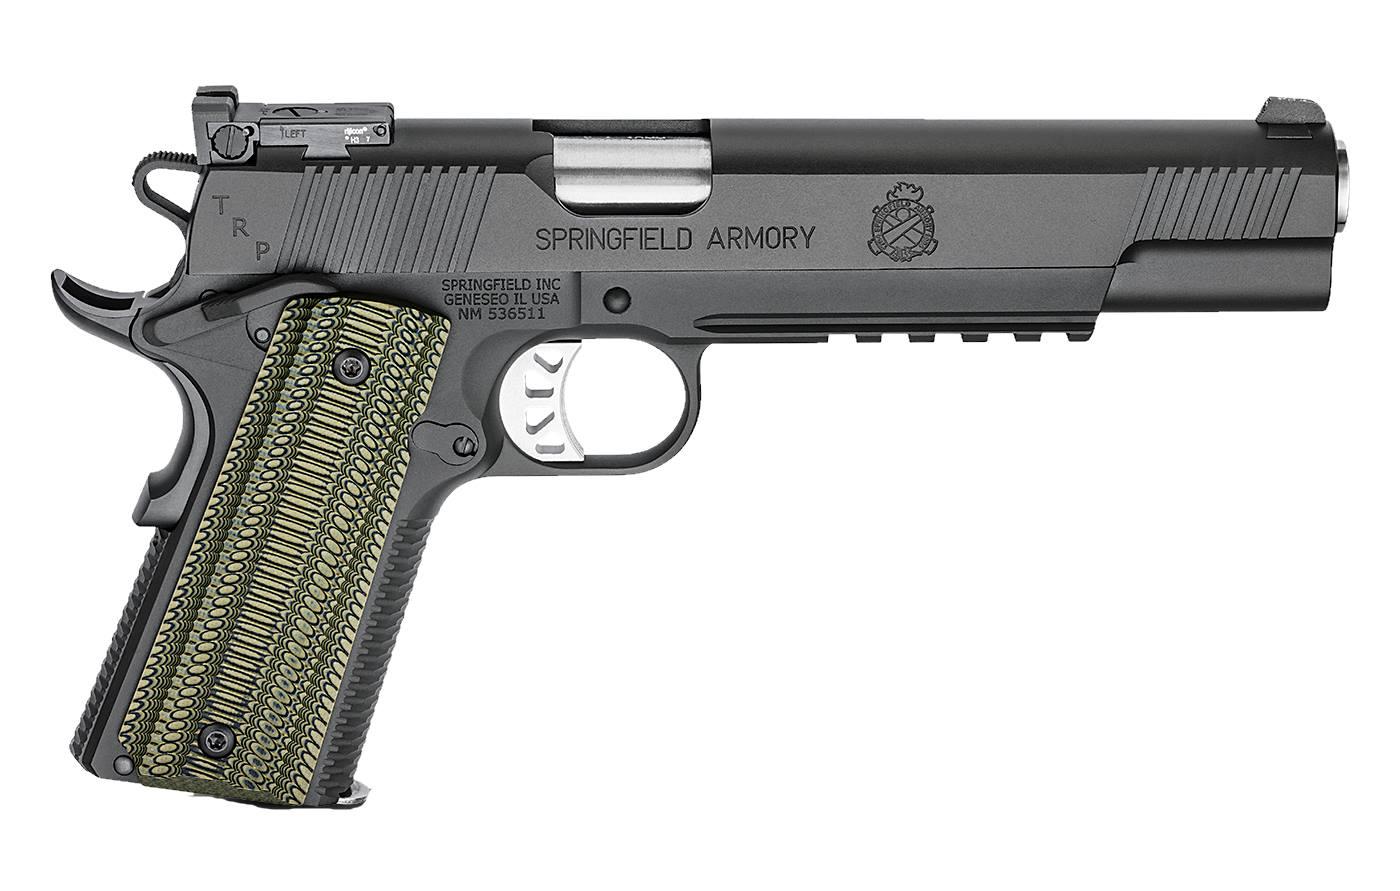 Springfield Armory TRP OPERATOR BLACK 10MM